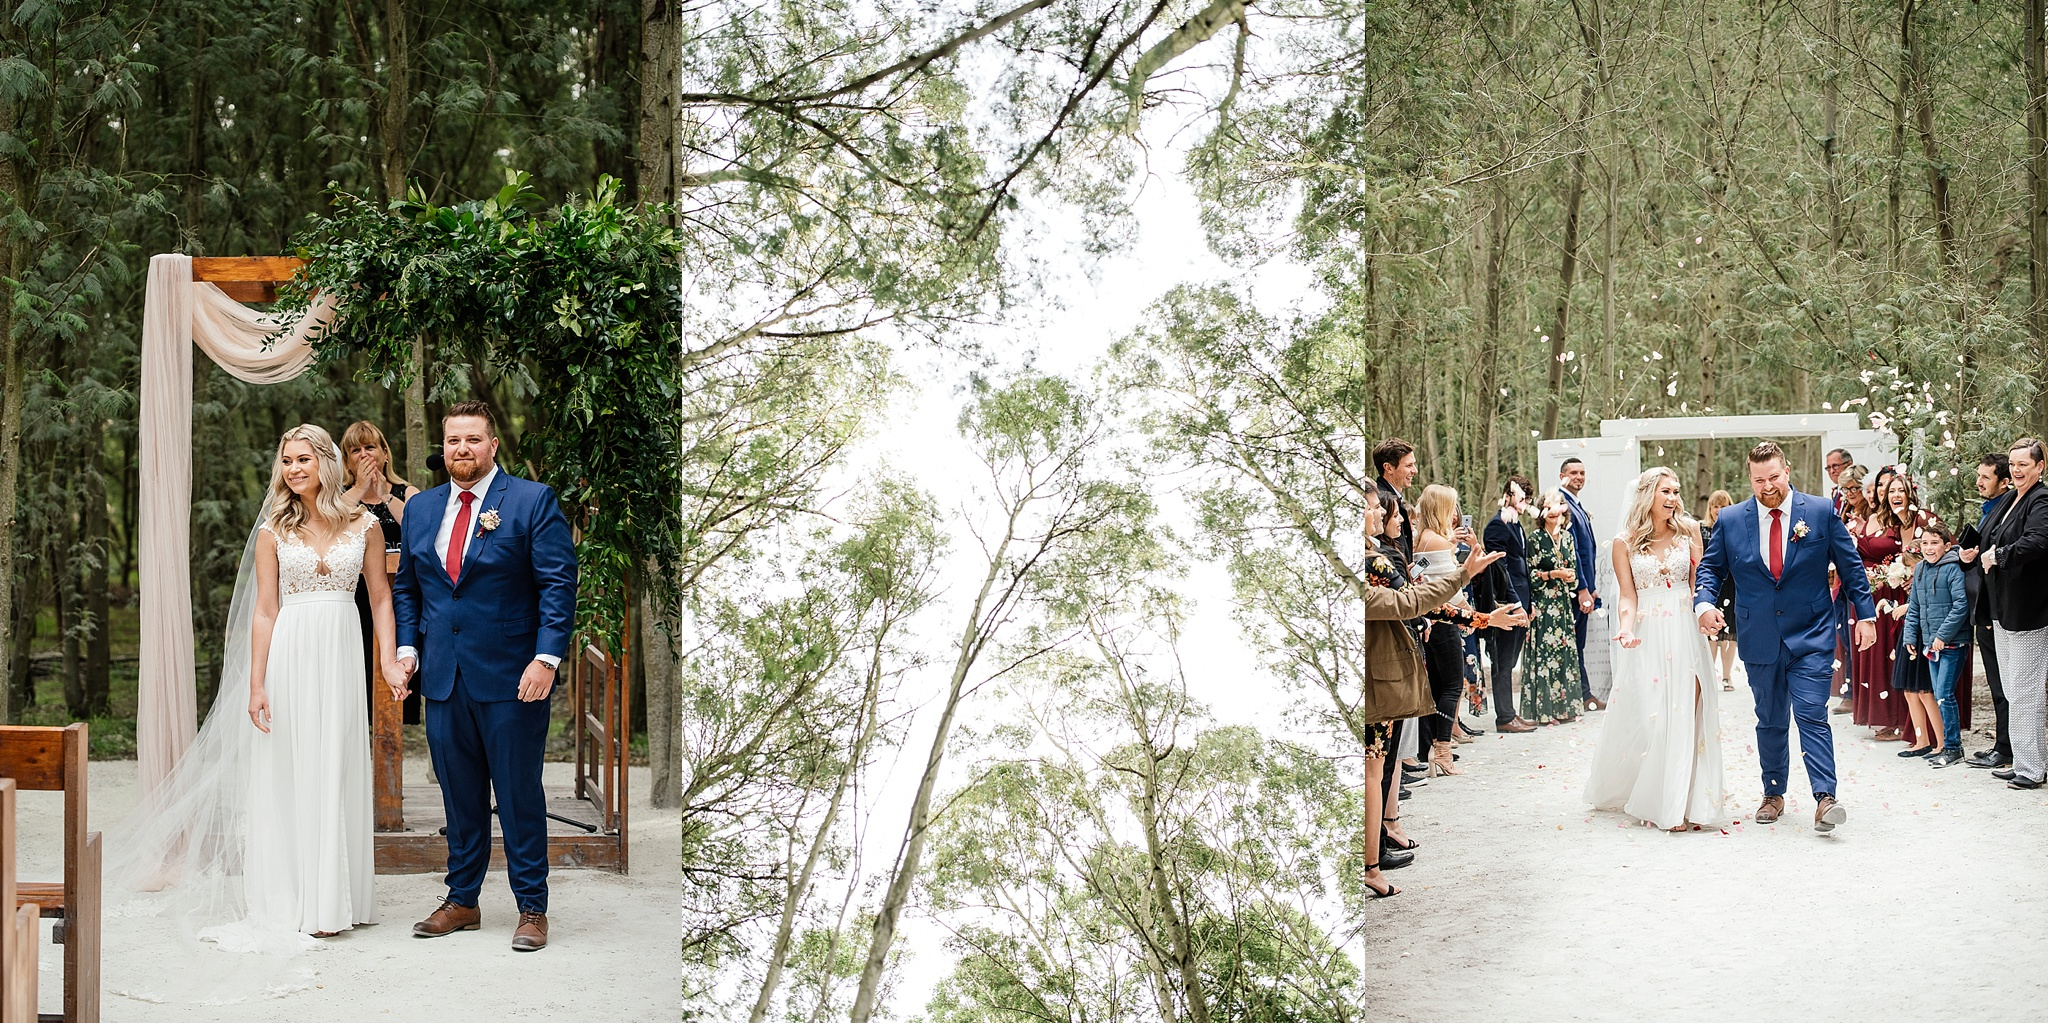 Cape Town Photographer Darren Bester - Die Woud Wedding - Gareth & Roxanne_0024.jpg